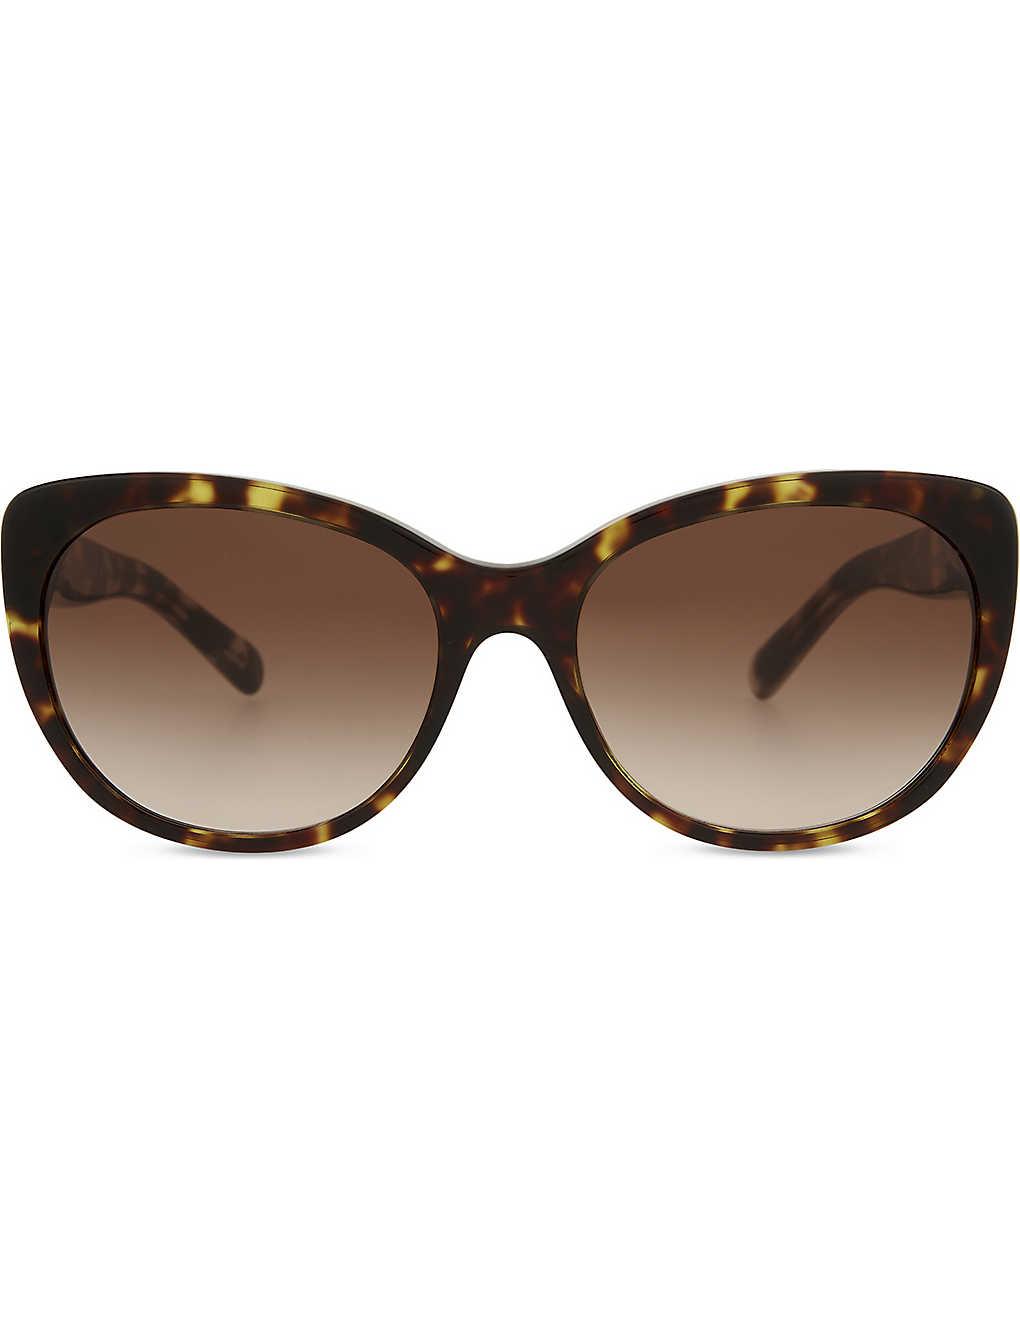 d7262eb0b202 BURBERRY - BE4224 cat-eye tortoiseshell sunglasses | Selfridges.com